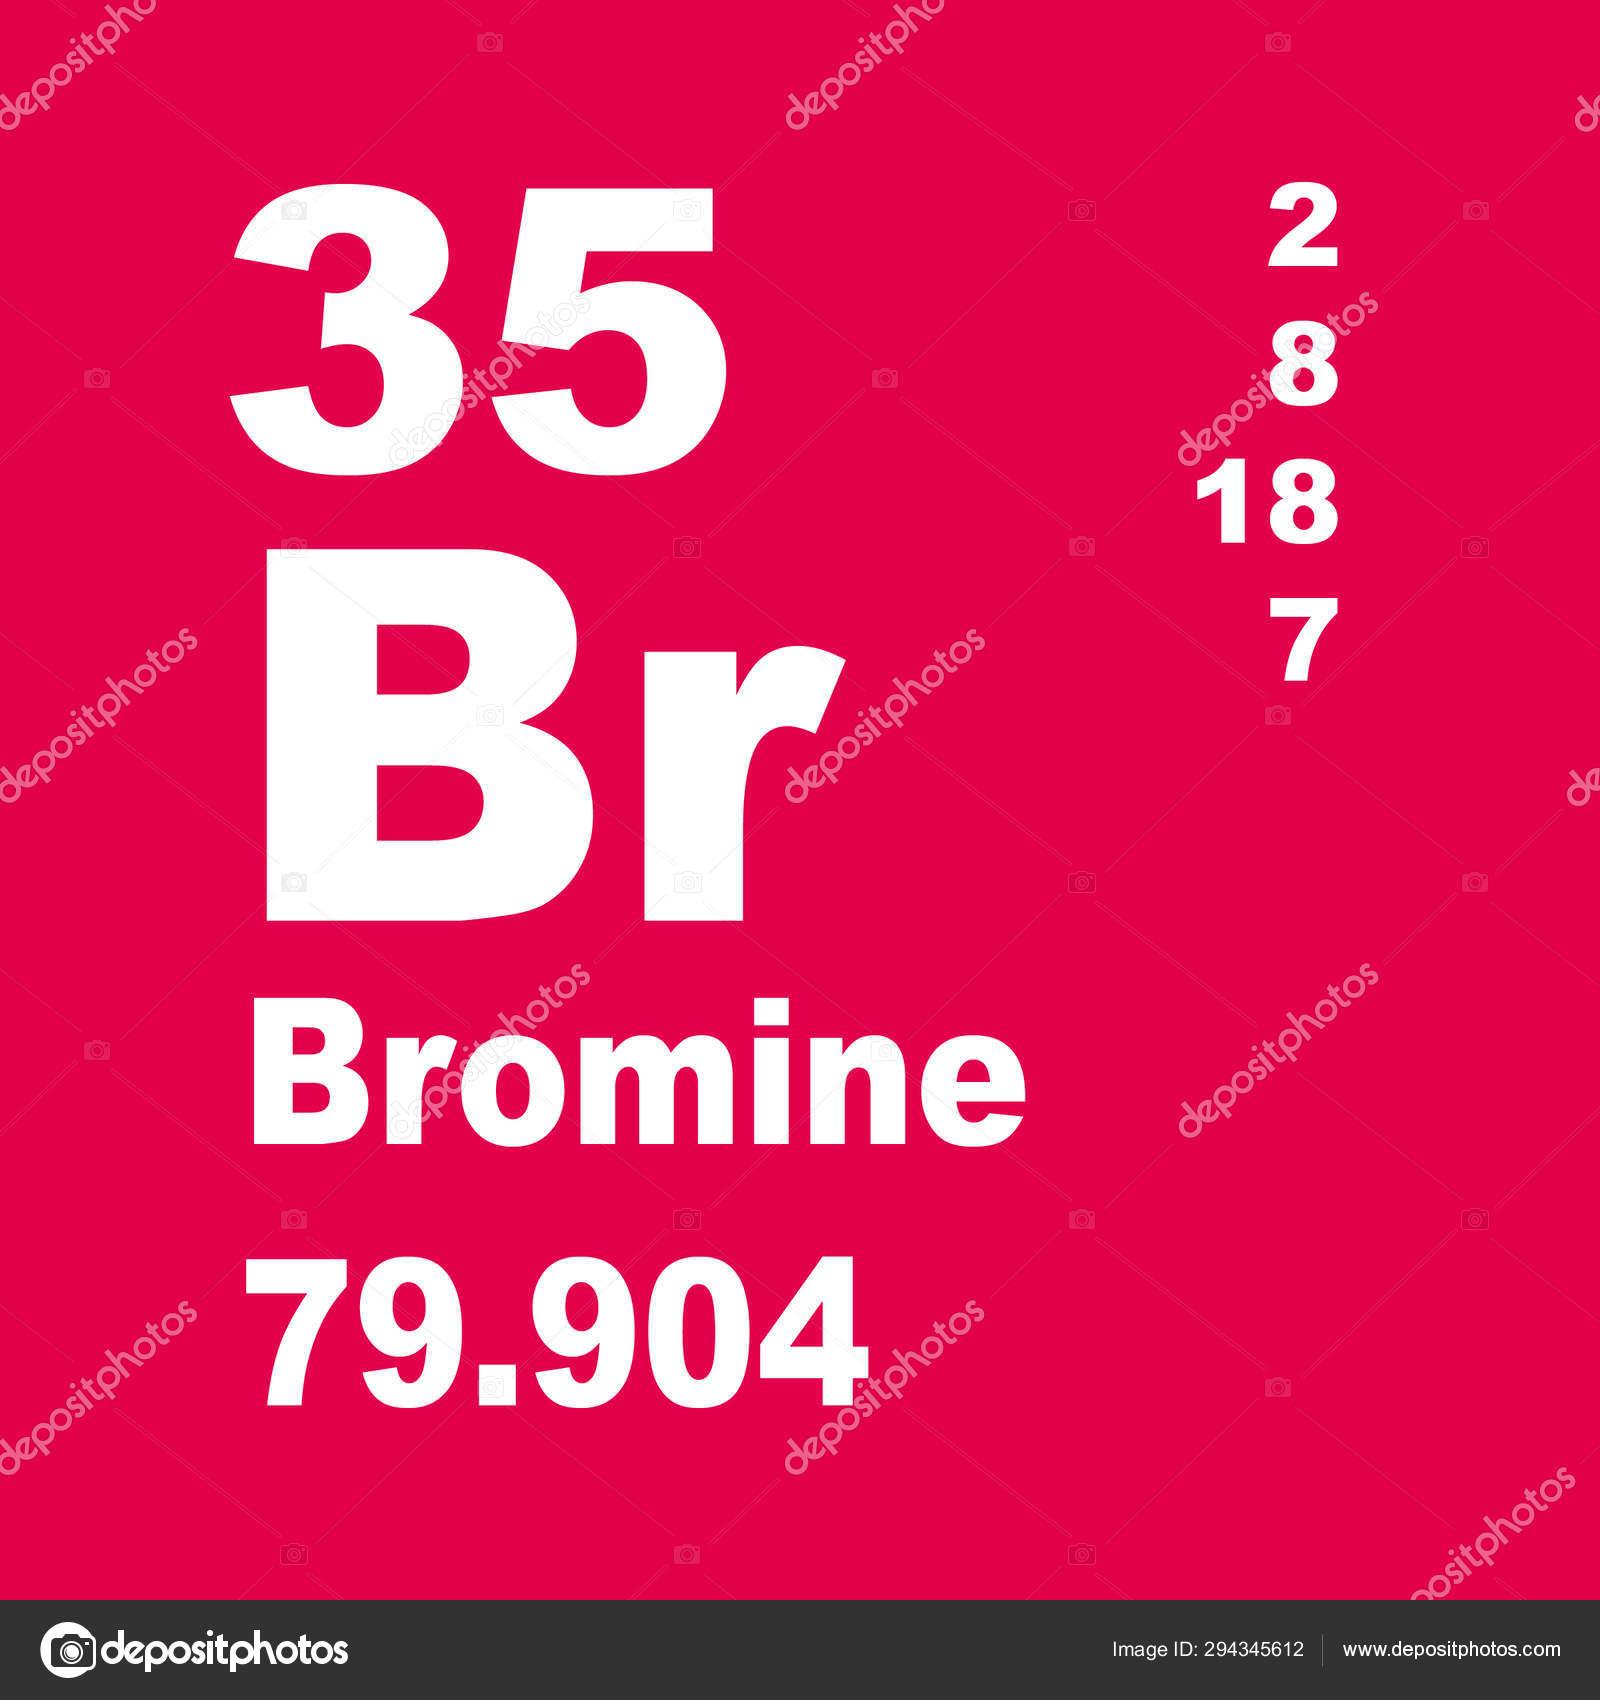 Bromine Periodic Table Elements Stock Photo C Imwaltersy